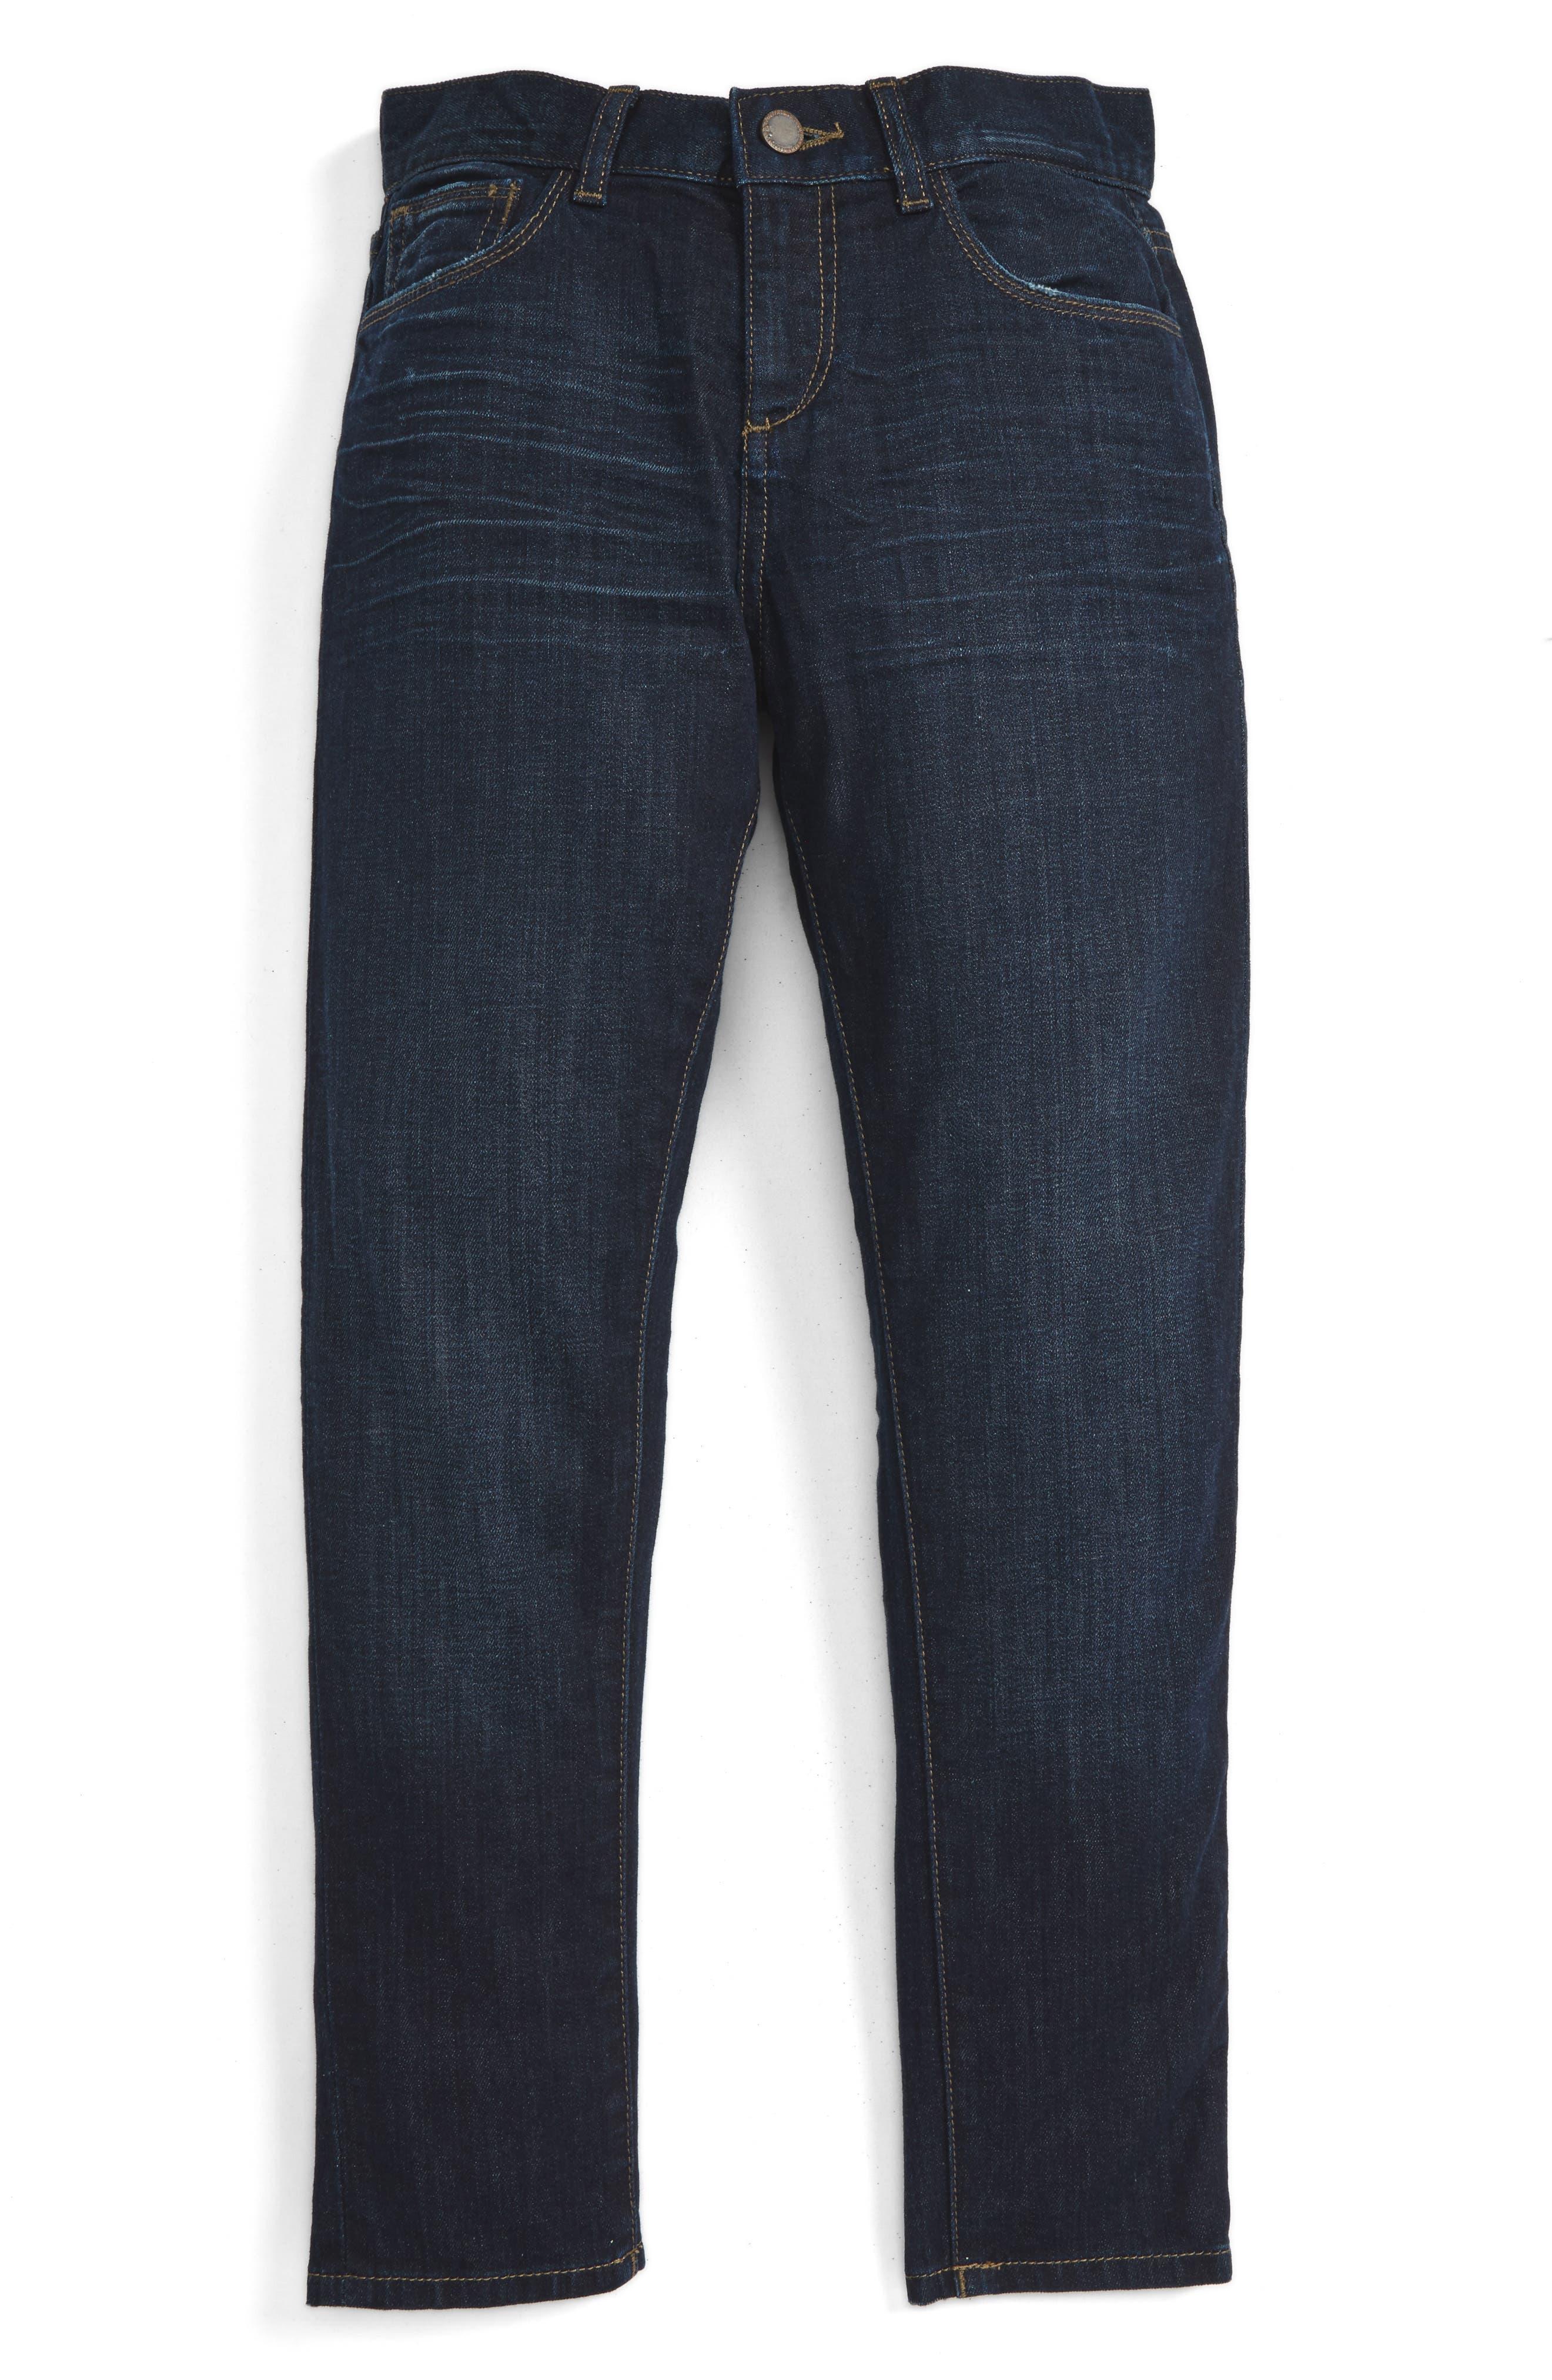 DL1961 Harry Slouchy Skinny Jeans